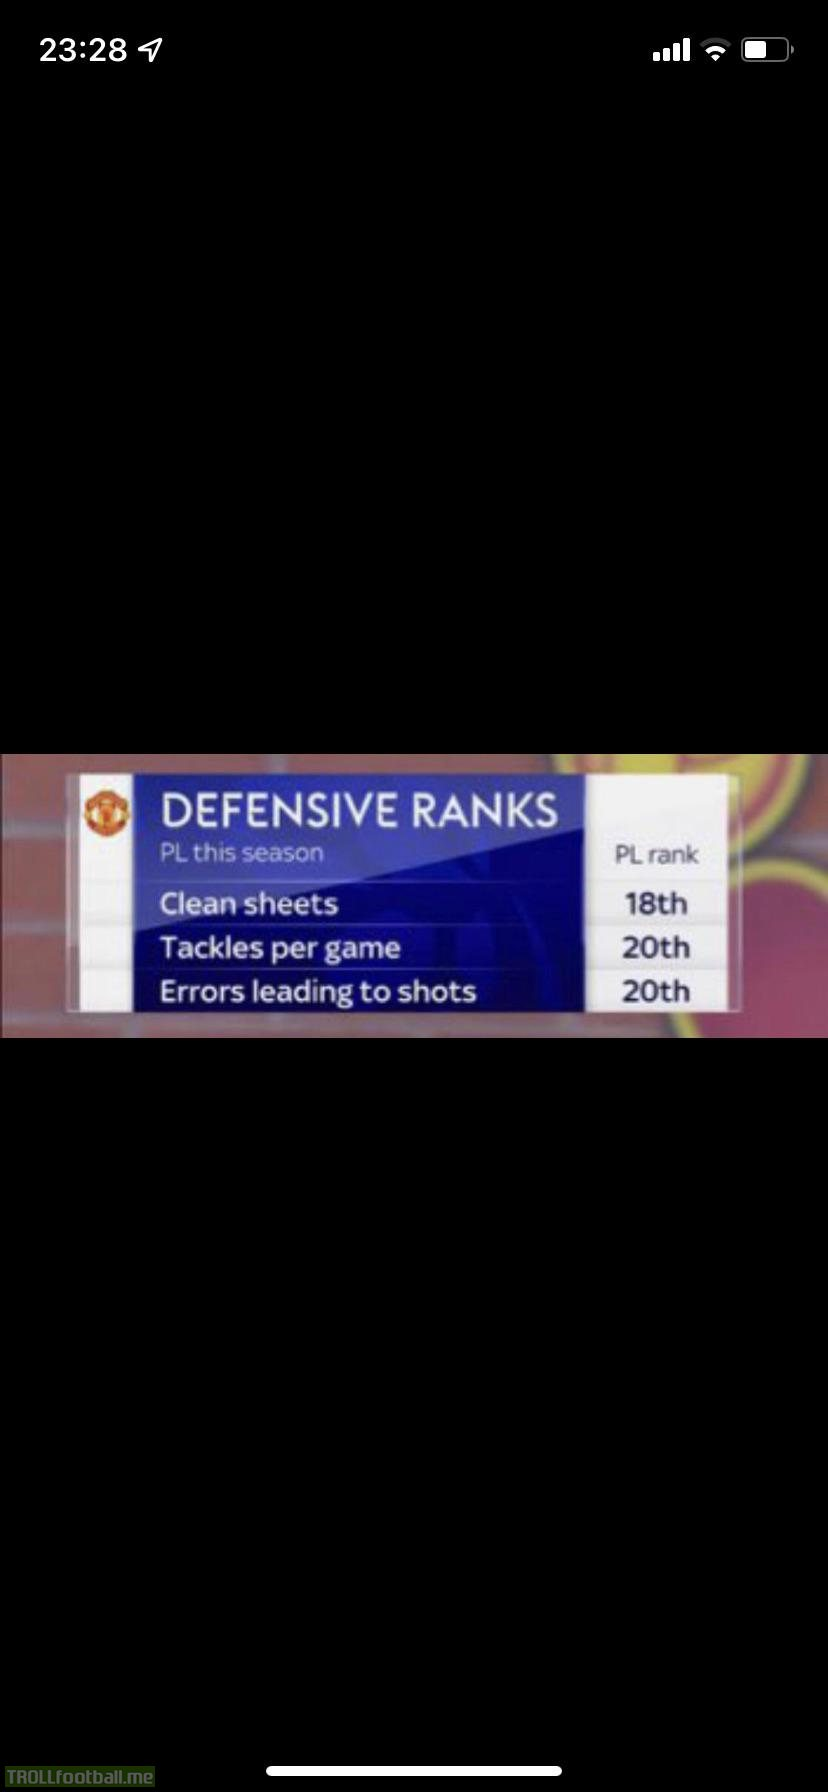 Manchester United's defensive statistics so far this season